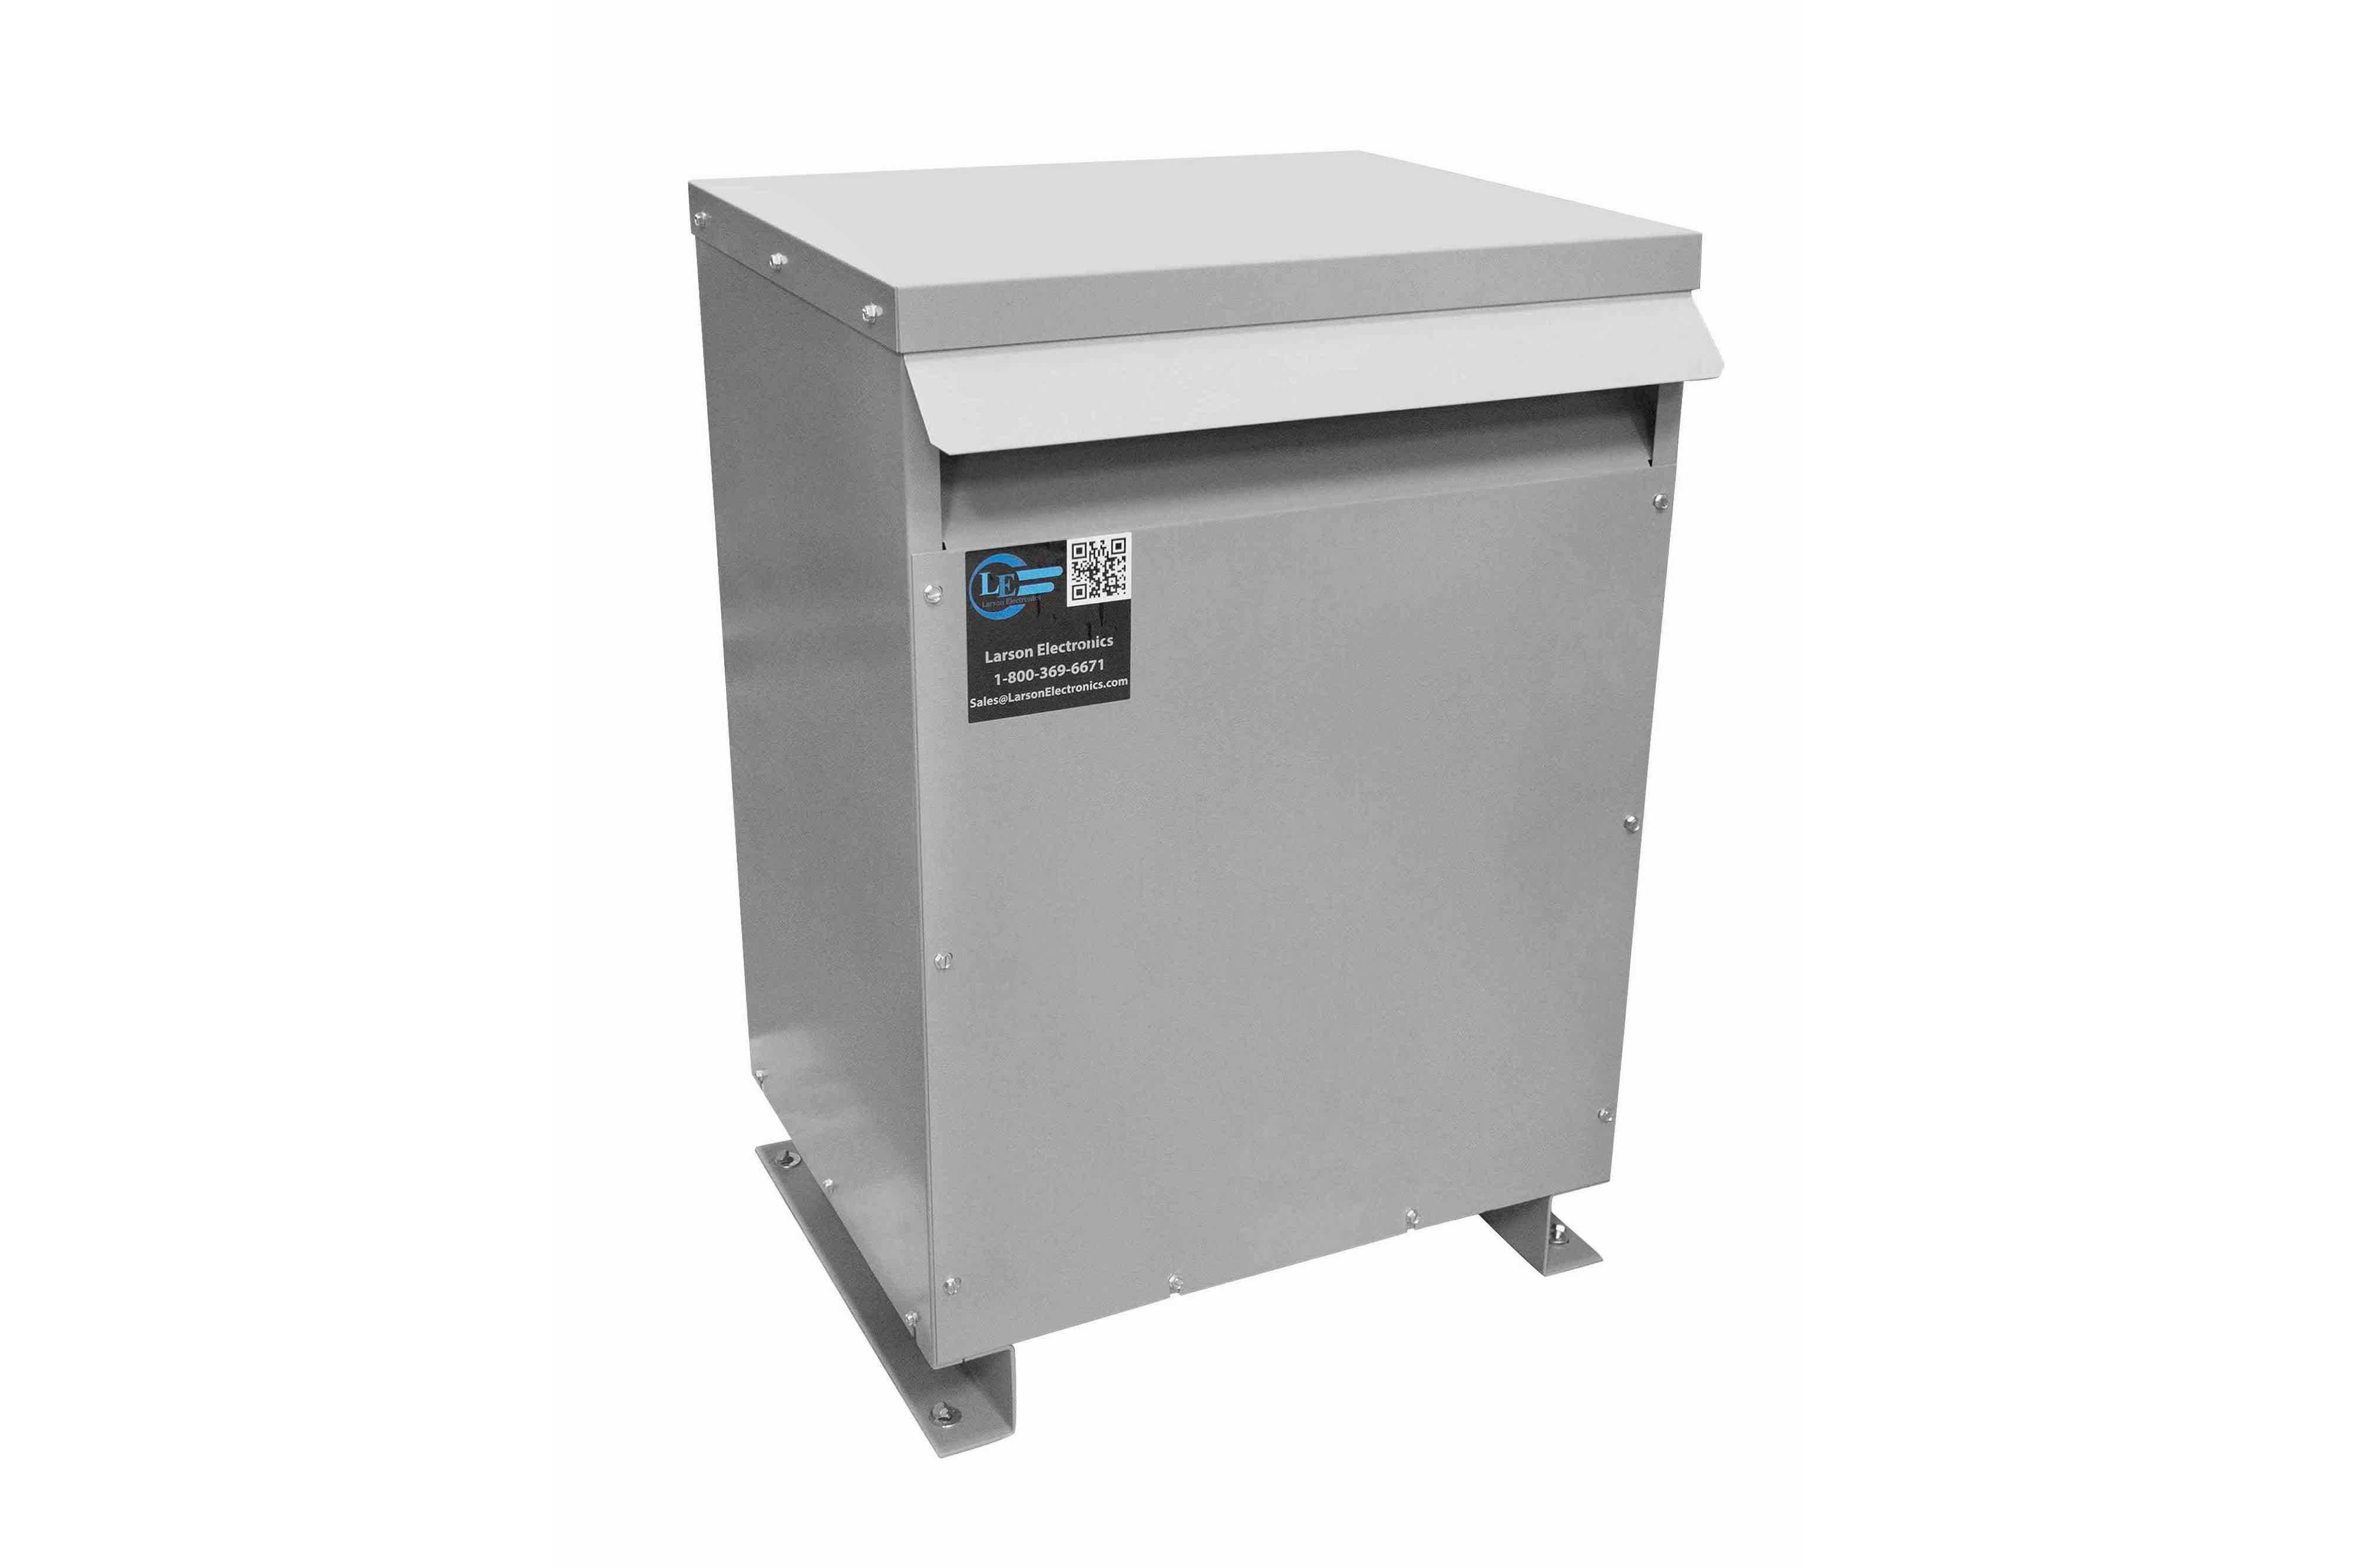 20 kVA 3PH Isolation Transformer, 480V Wye Primary, 240V/120 Delta Secondary, N3R, Ventilated, 60 Hz